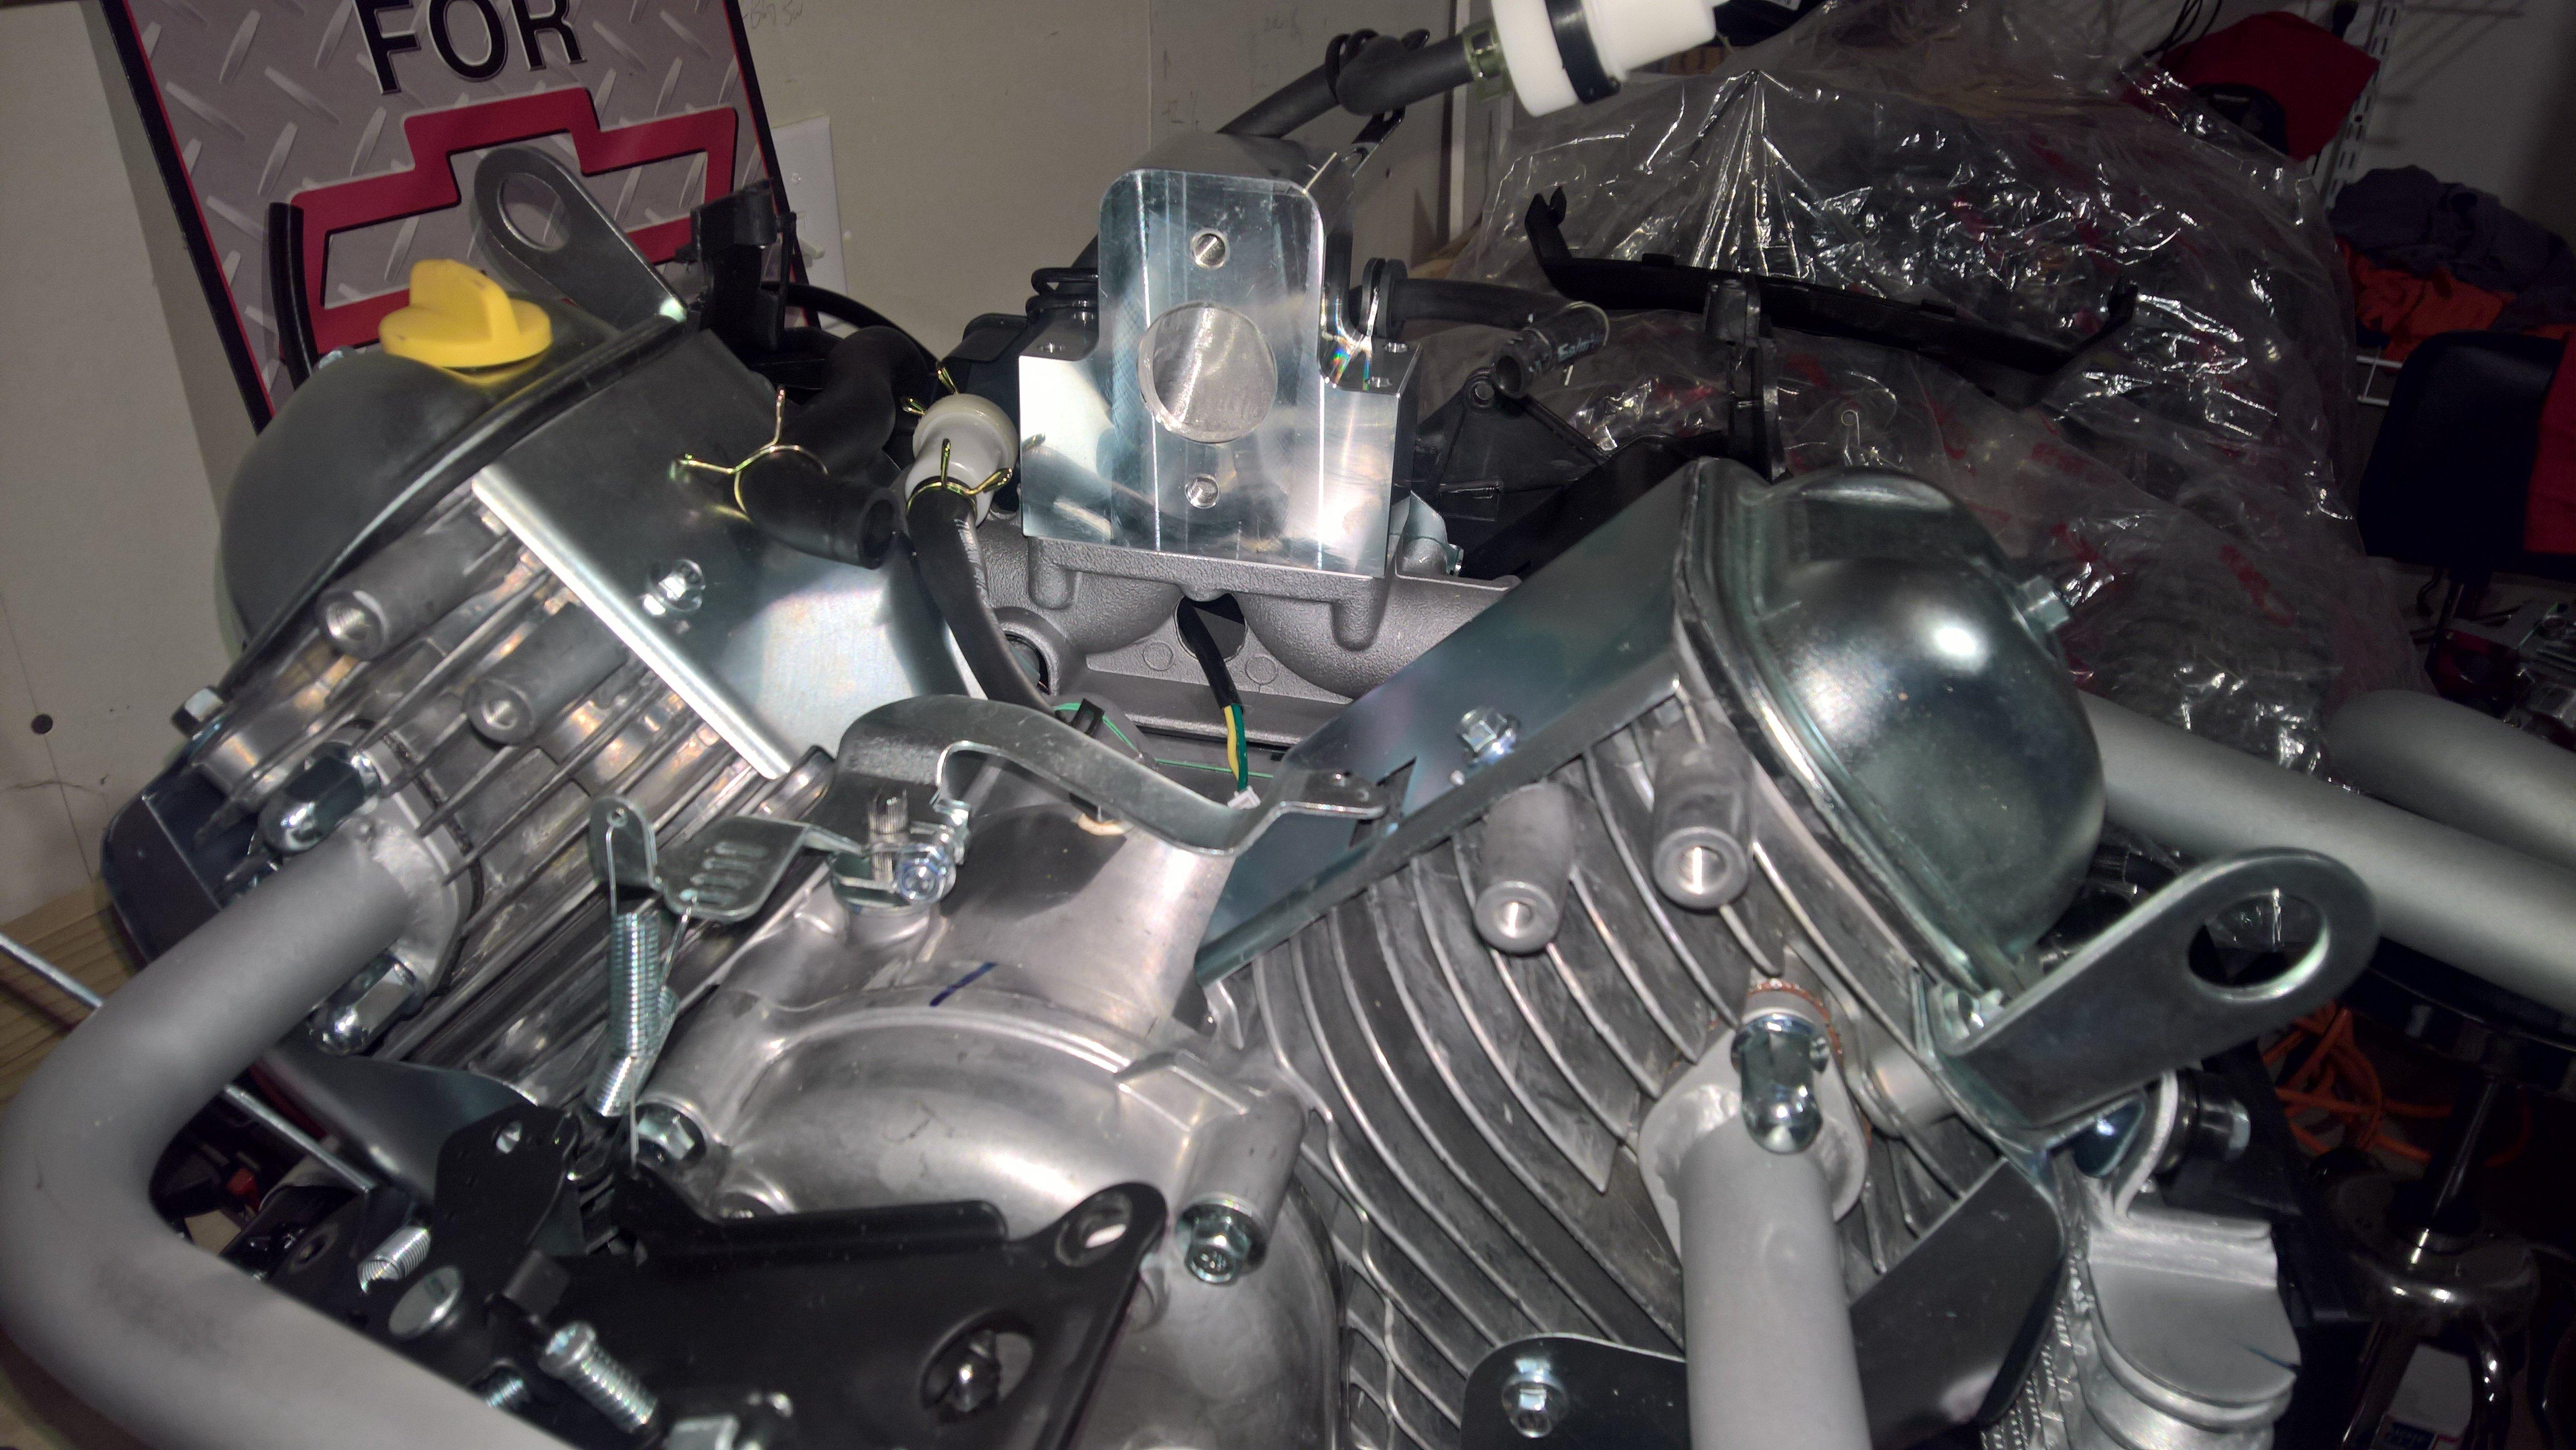 subaru 265cc engine diagram american sportworks 650 2wd engine swap  to predator 670 other  american sportworks 650 2wd engine swap